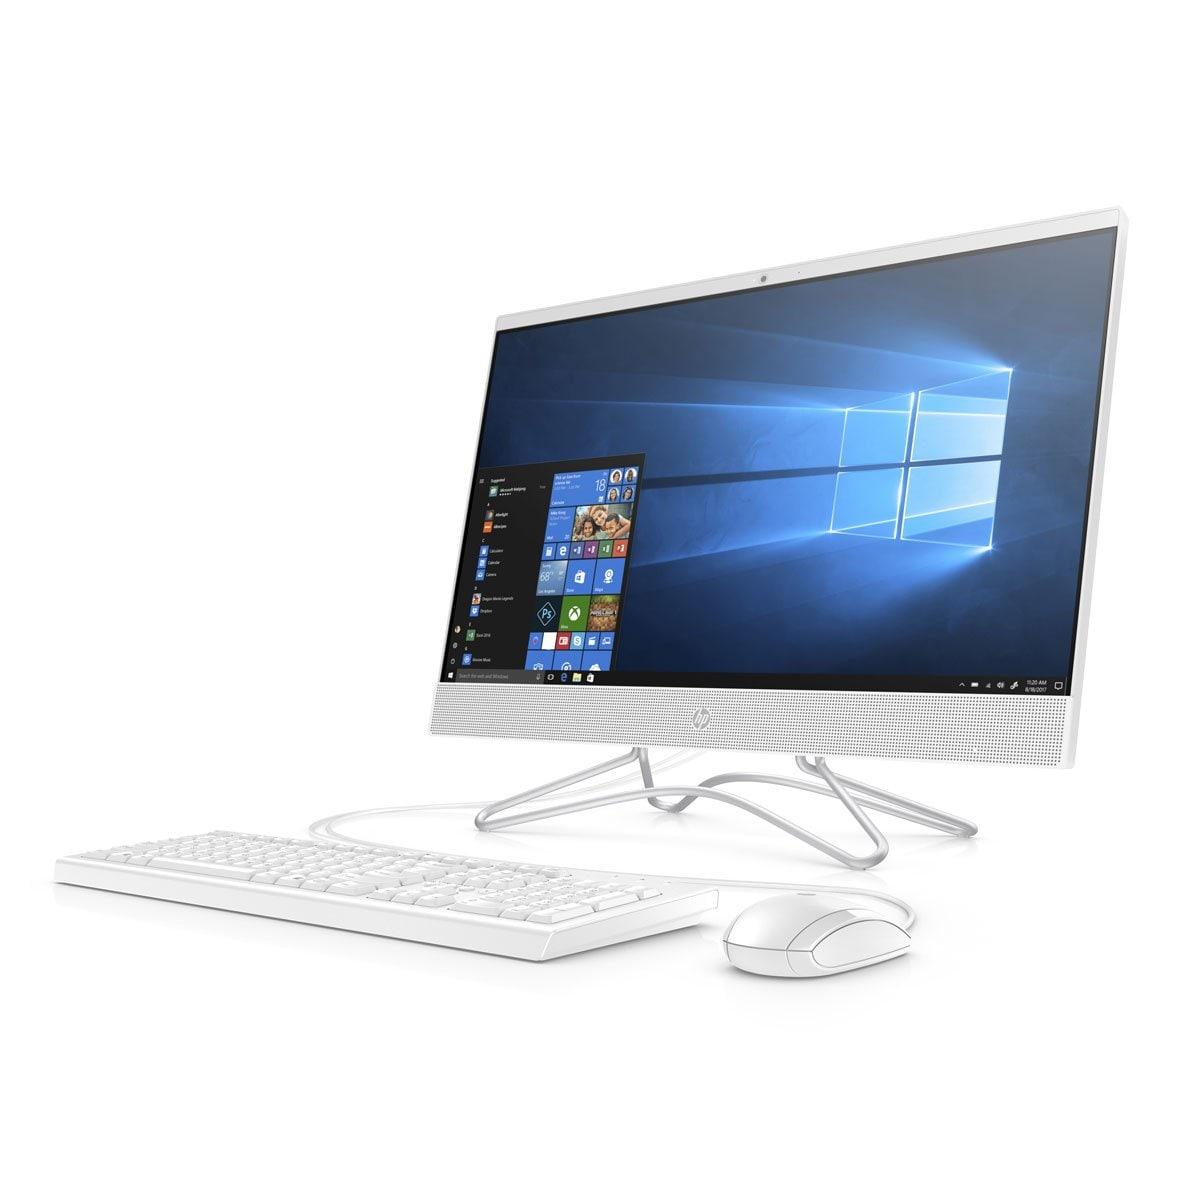 Desktop Aio 24-F101 Hp